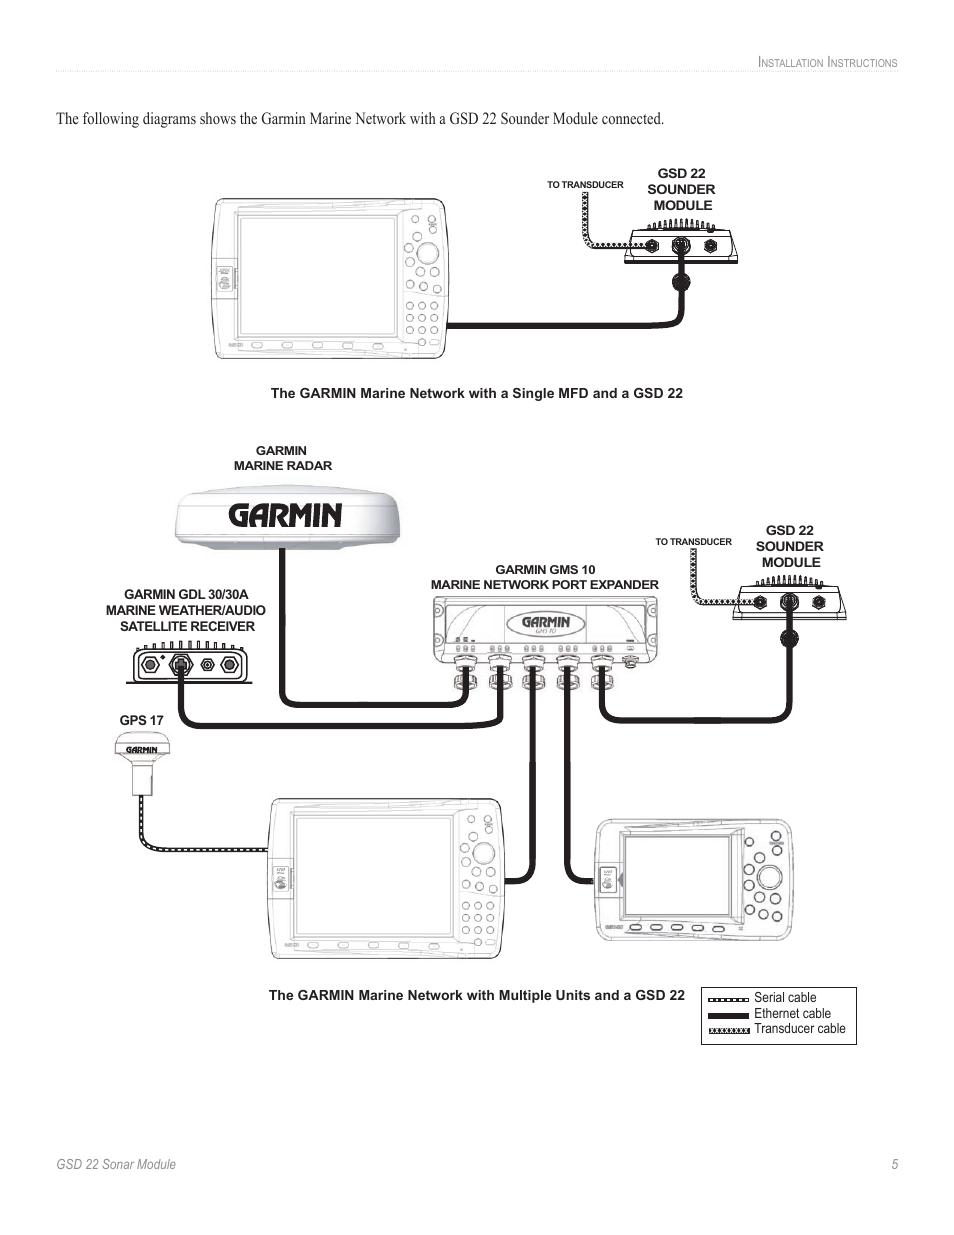 Garmin Marine Chartplotter Wiring Diagram. . Wiring Diagram on